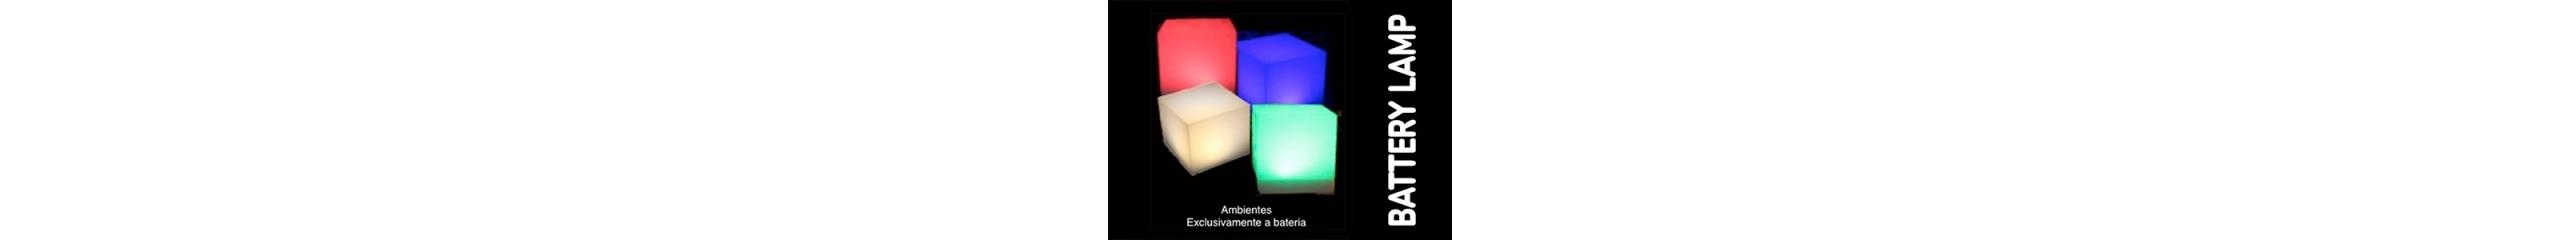 LED Batery Lamp